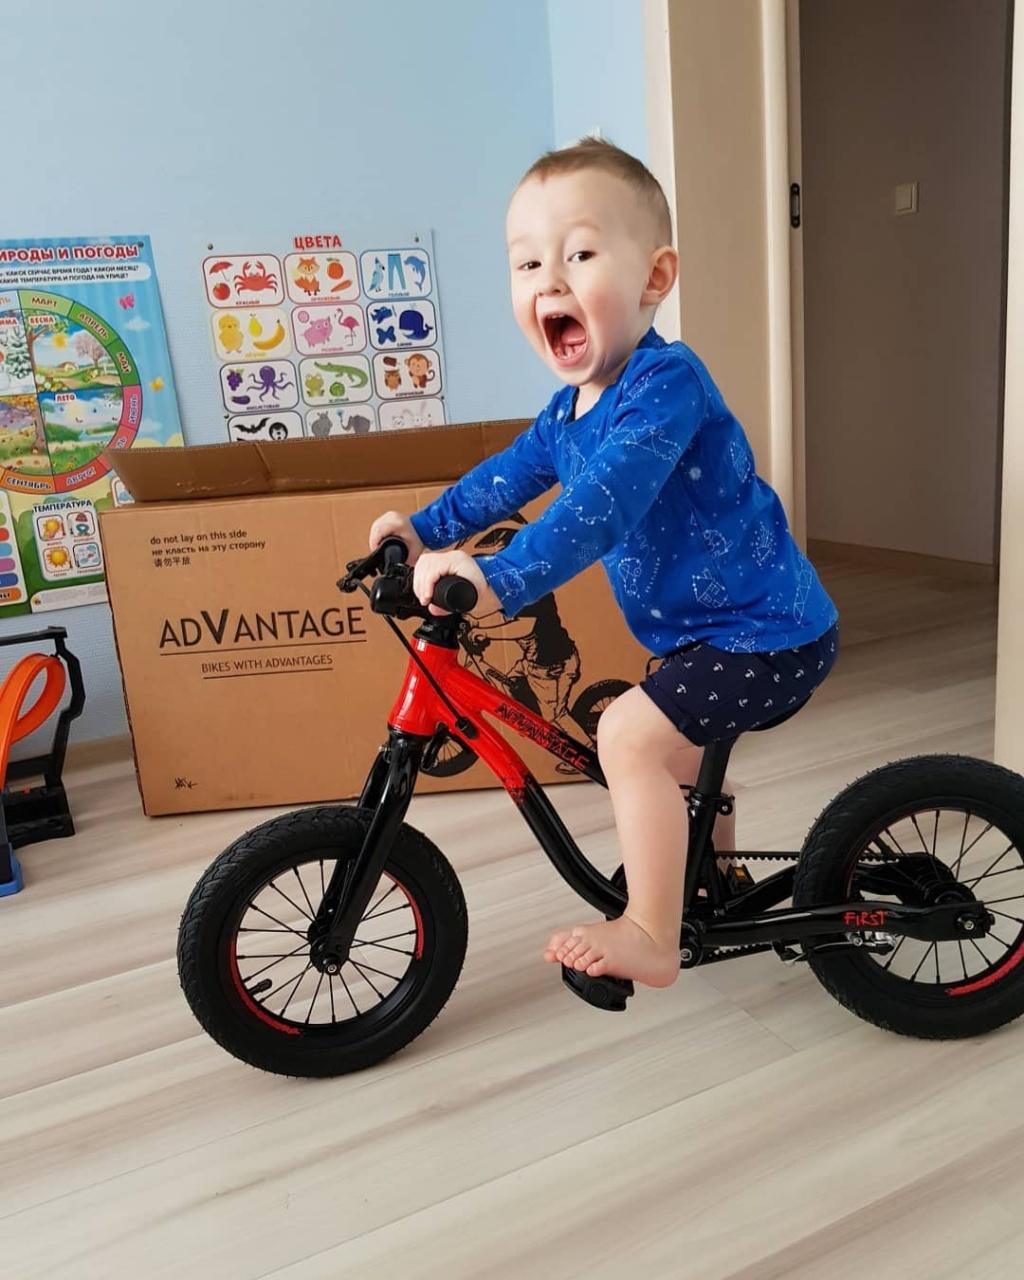 Блог им. Advantagebikes: Привет! Мы - Advantagebikes!